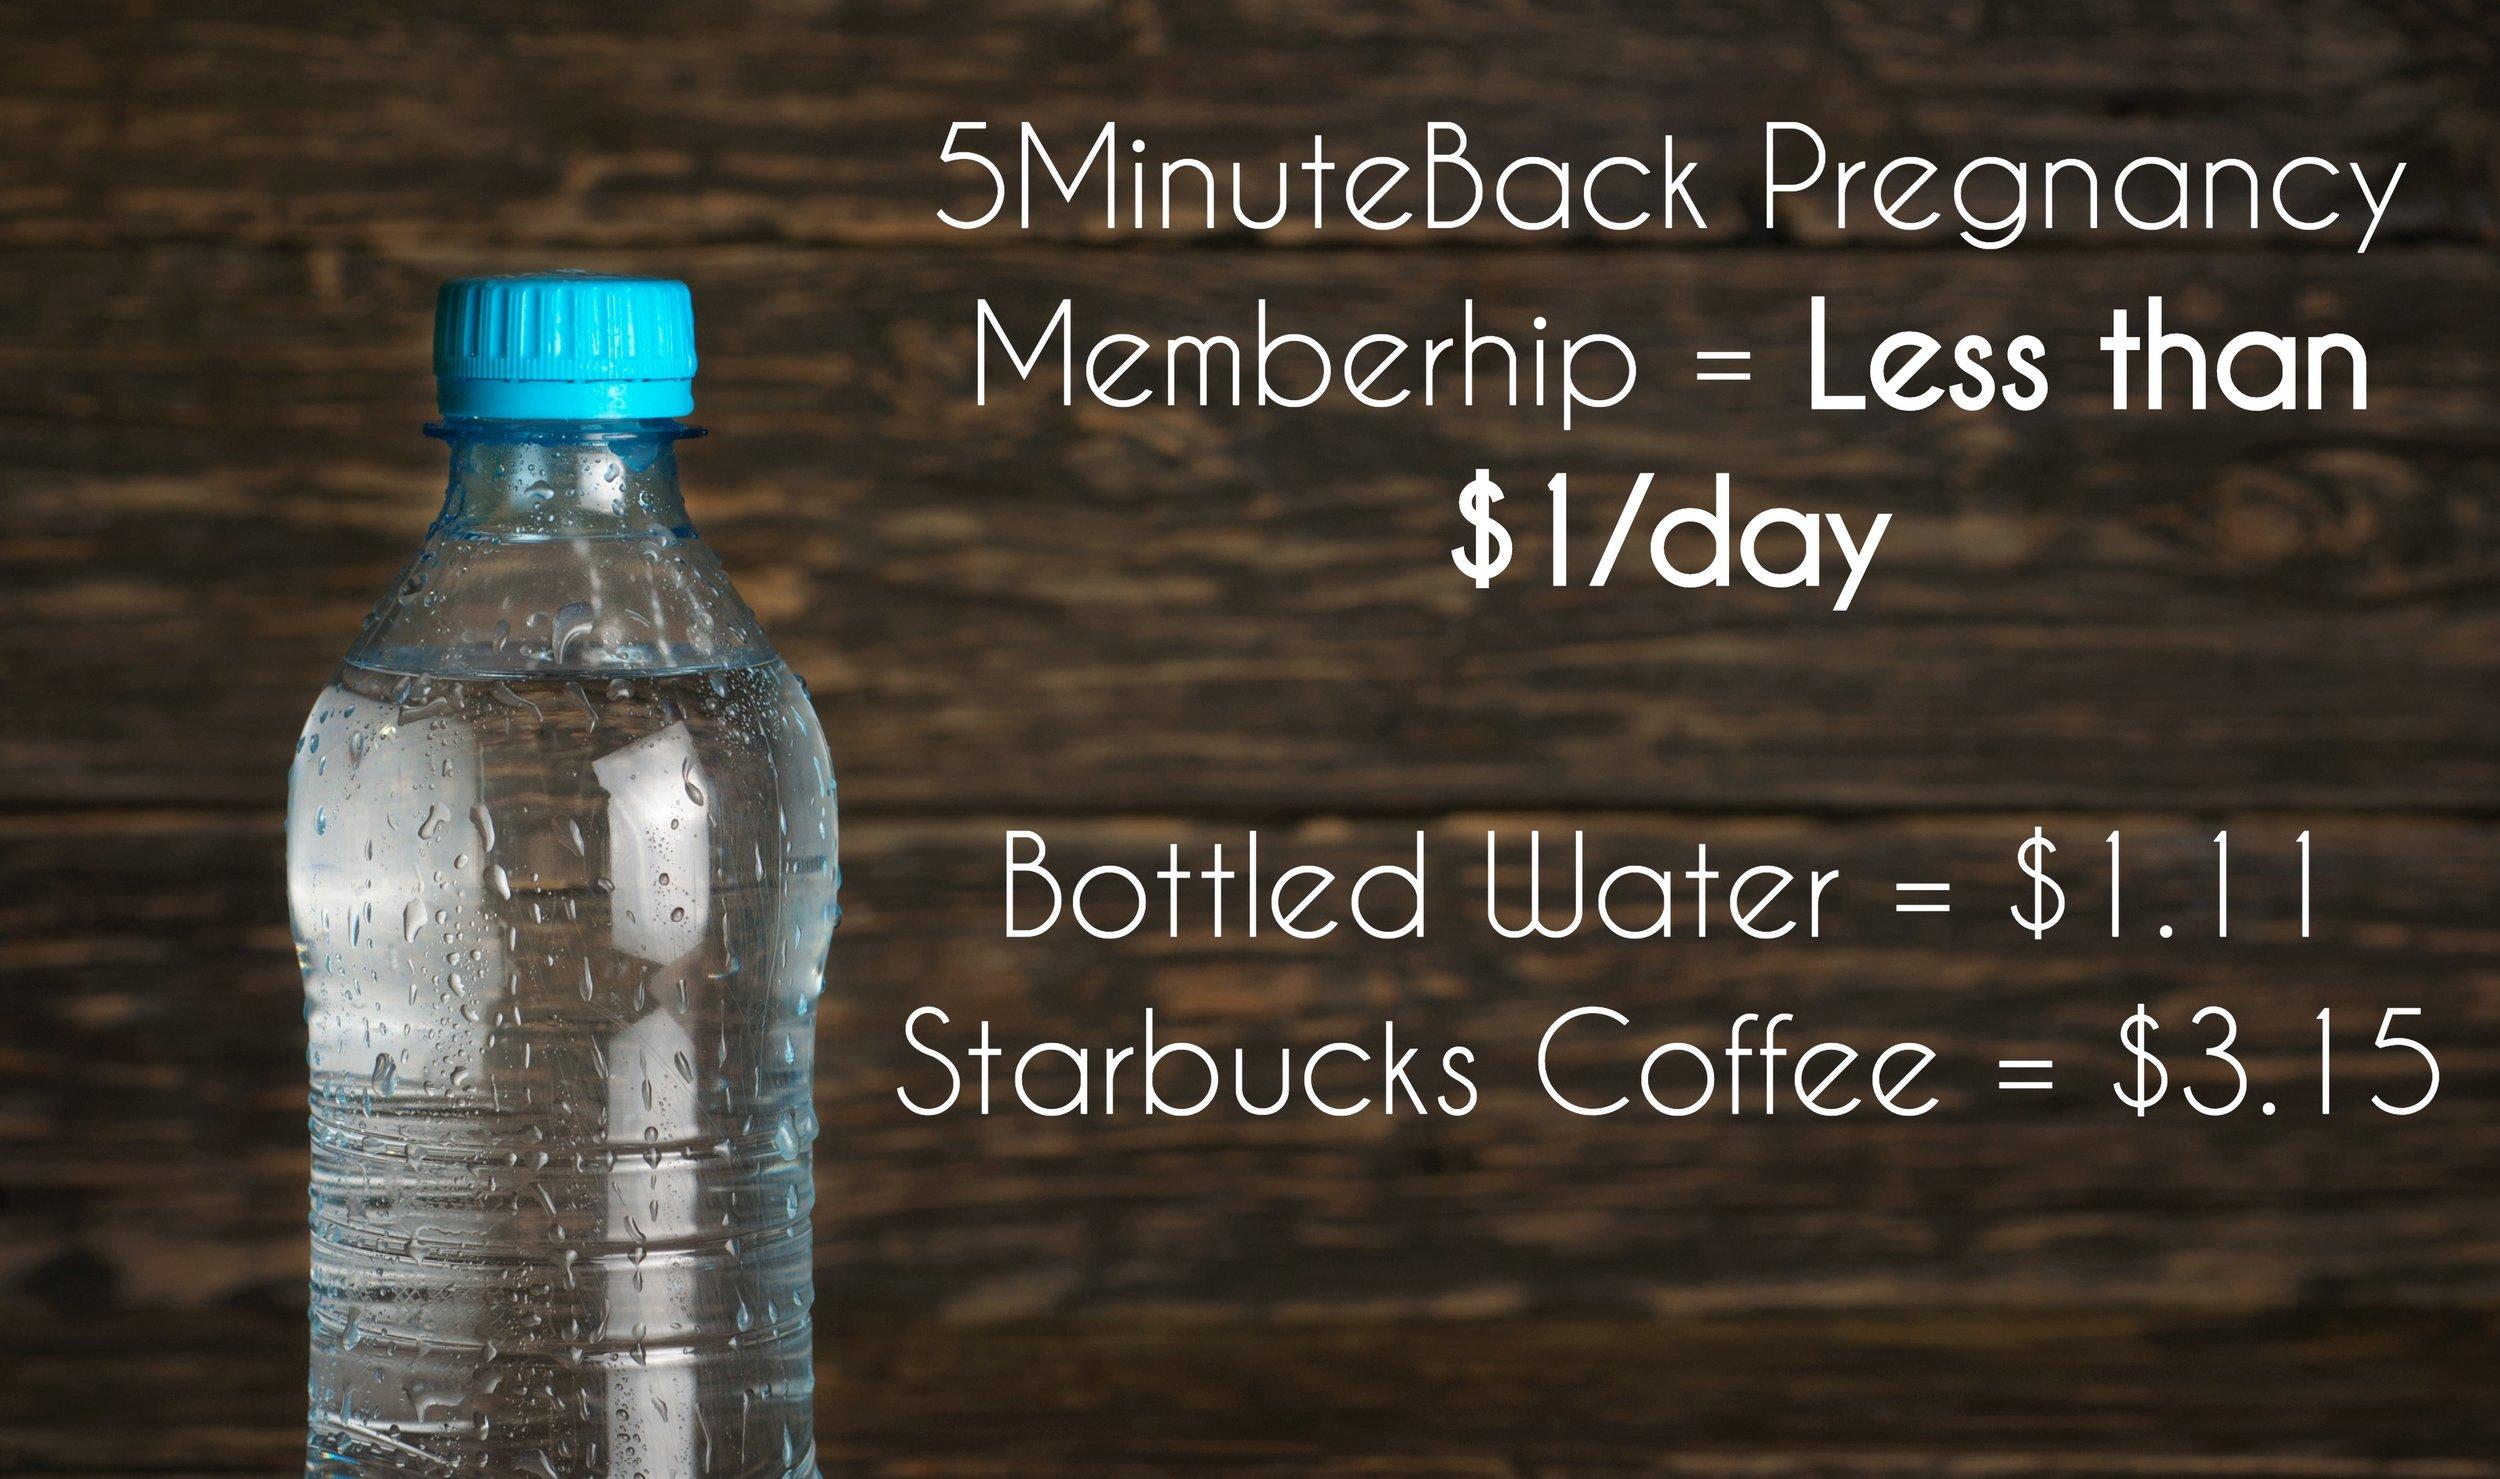 5MinuteBack Pregnancy Membership Less than $1/day